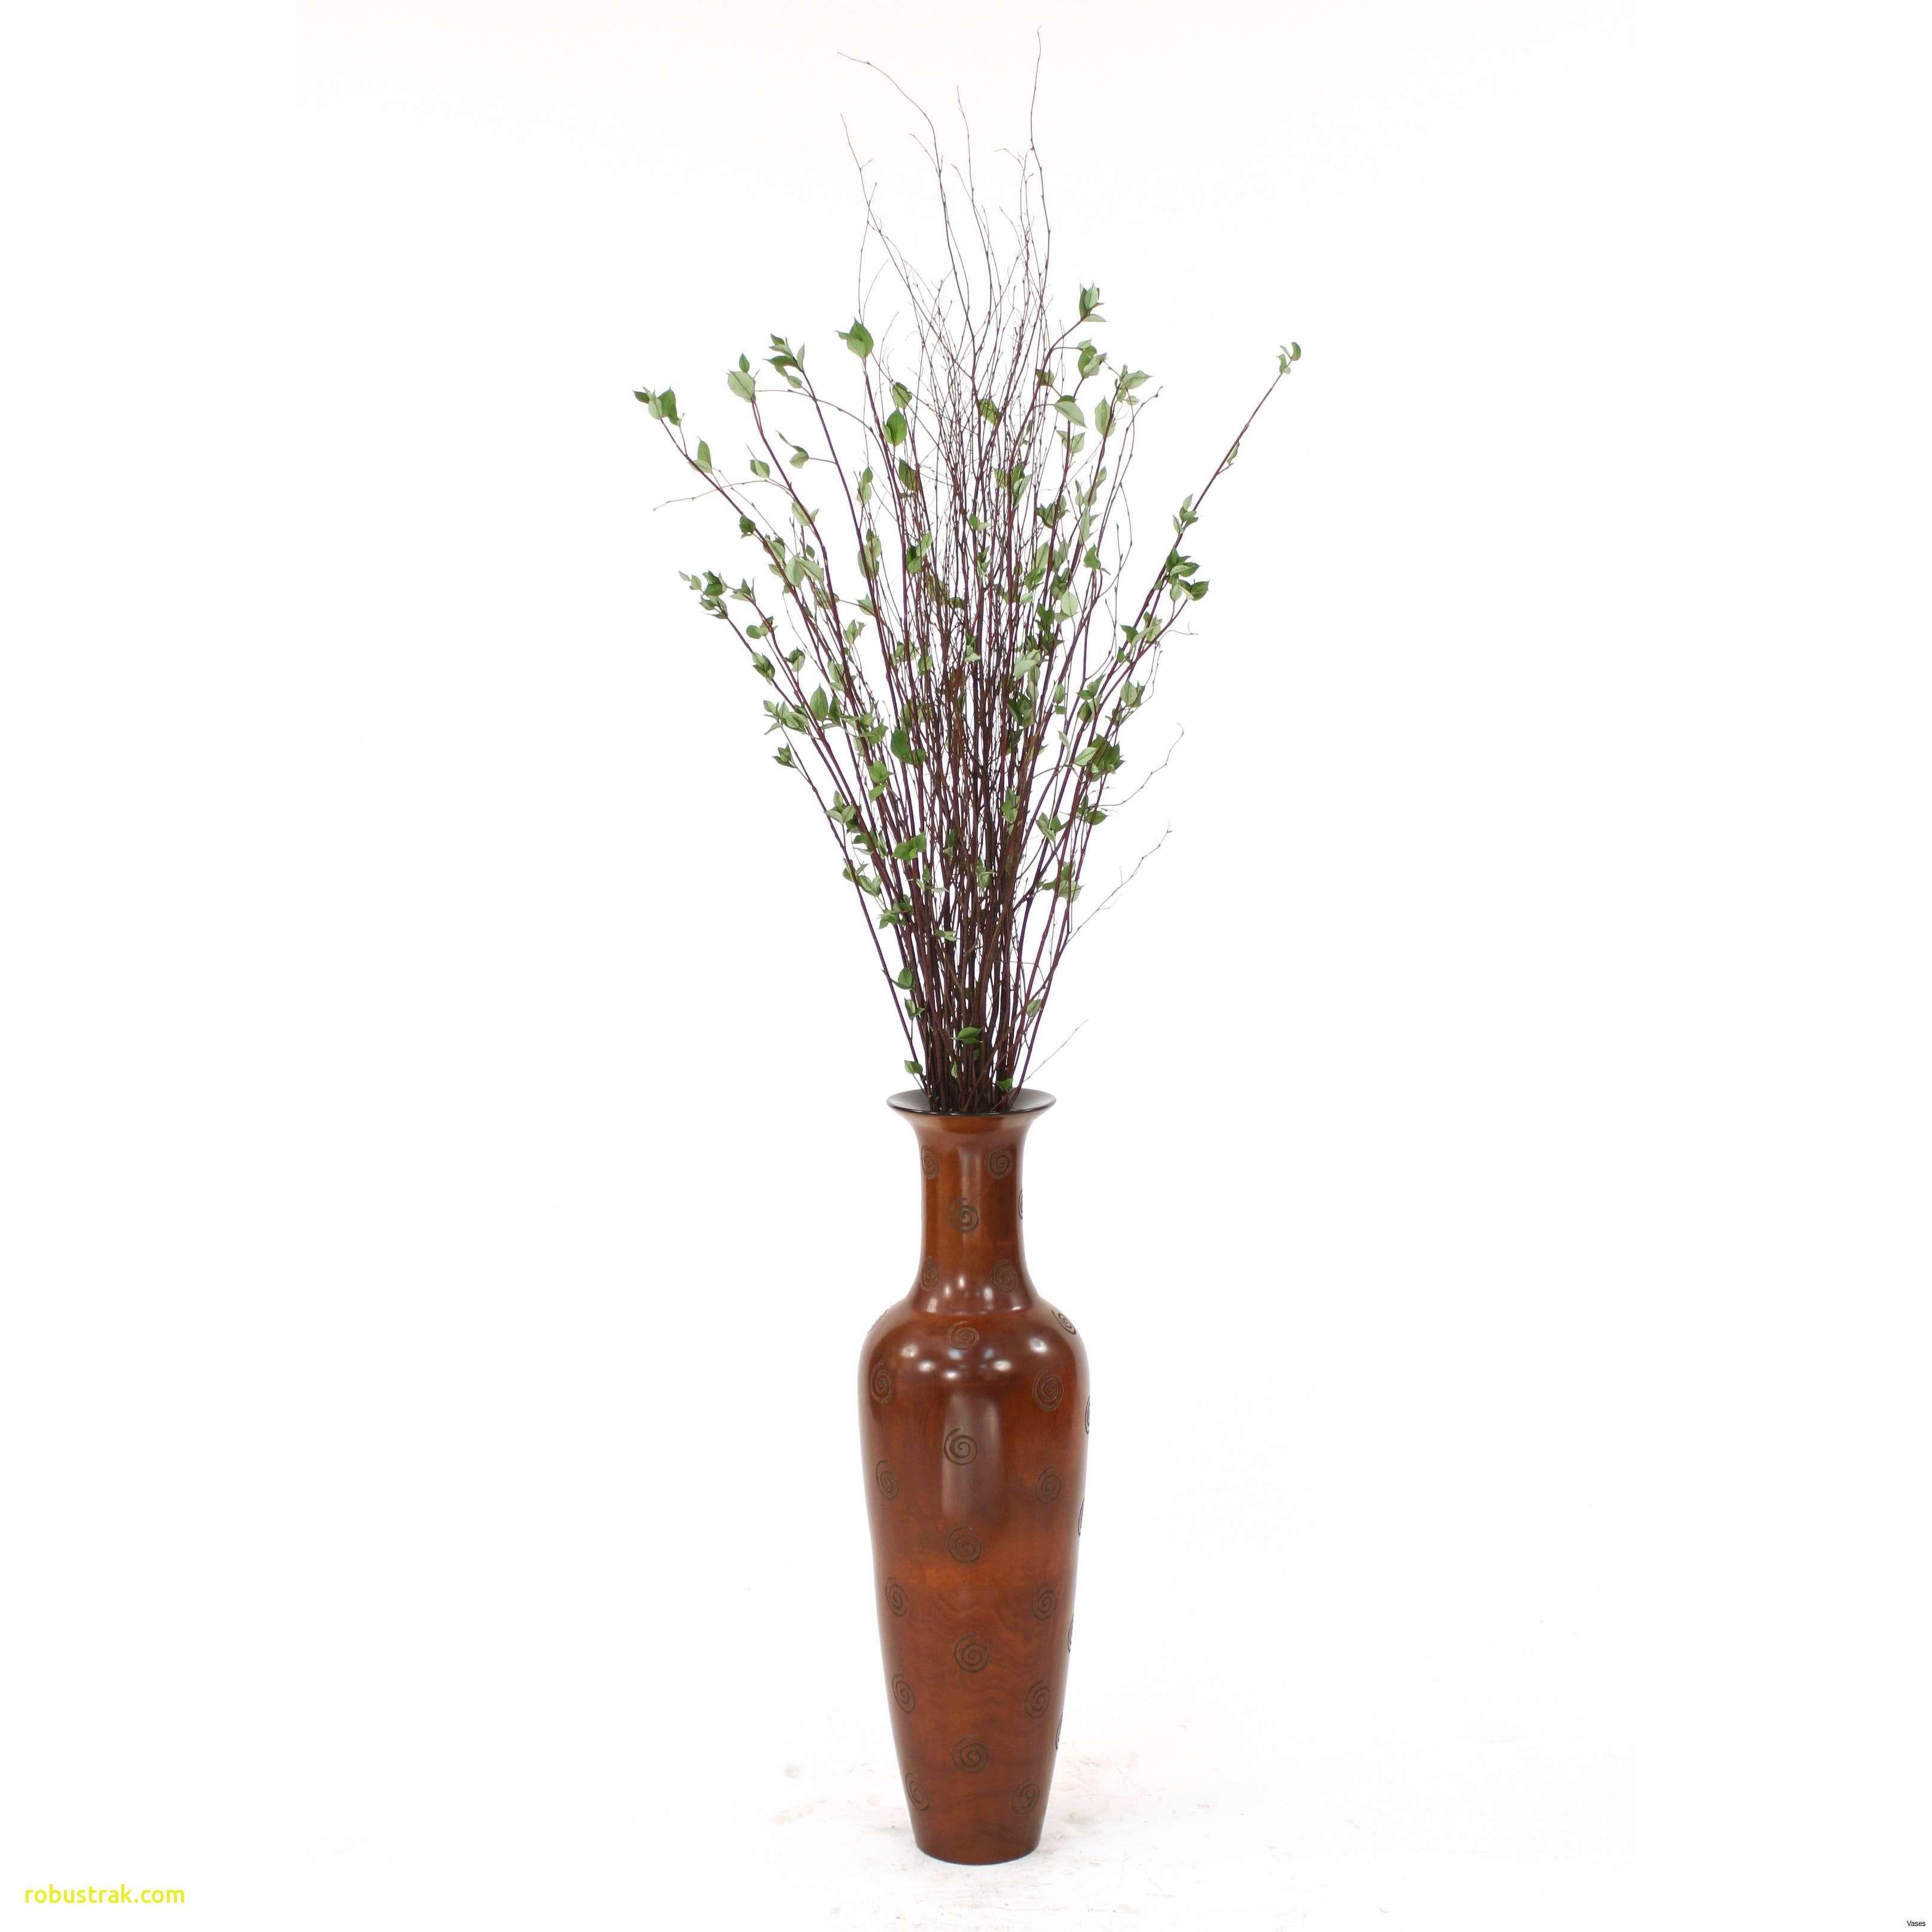 decorative sticks for tall vases of tall red floor vase lovely floor vase with sticks elegant 10 ways to intended for tall red floor vase lovely floor vase with sticks elegant 10 ways to fill empty corners